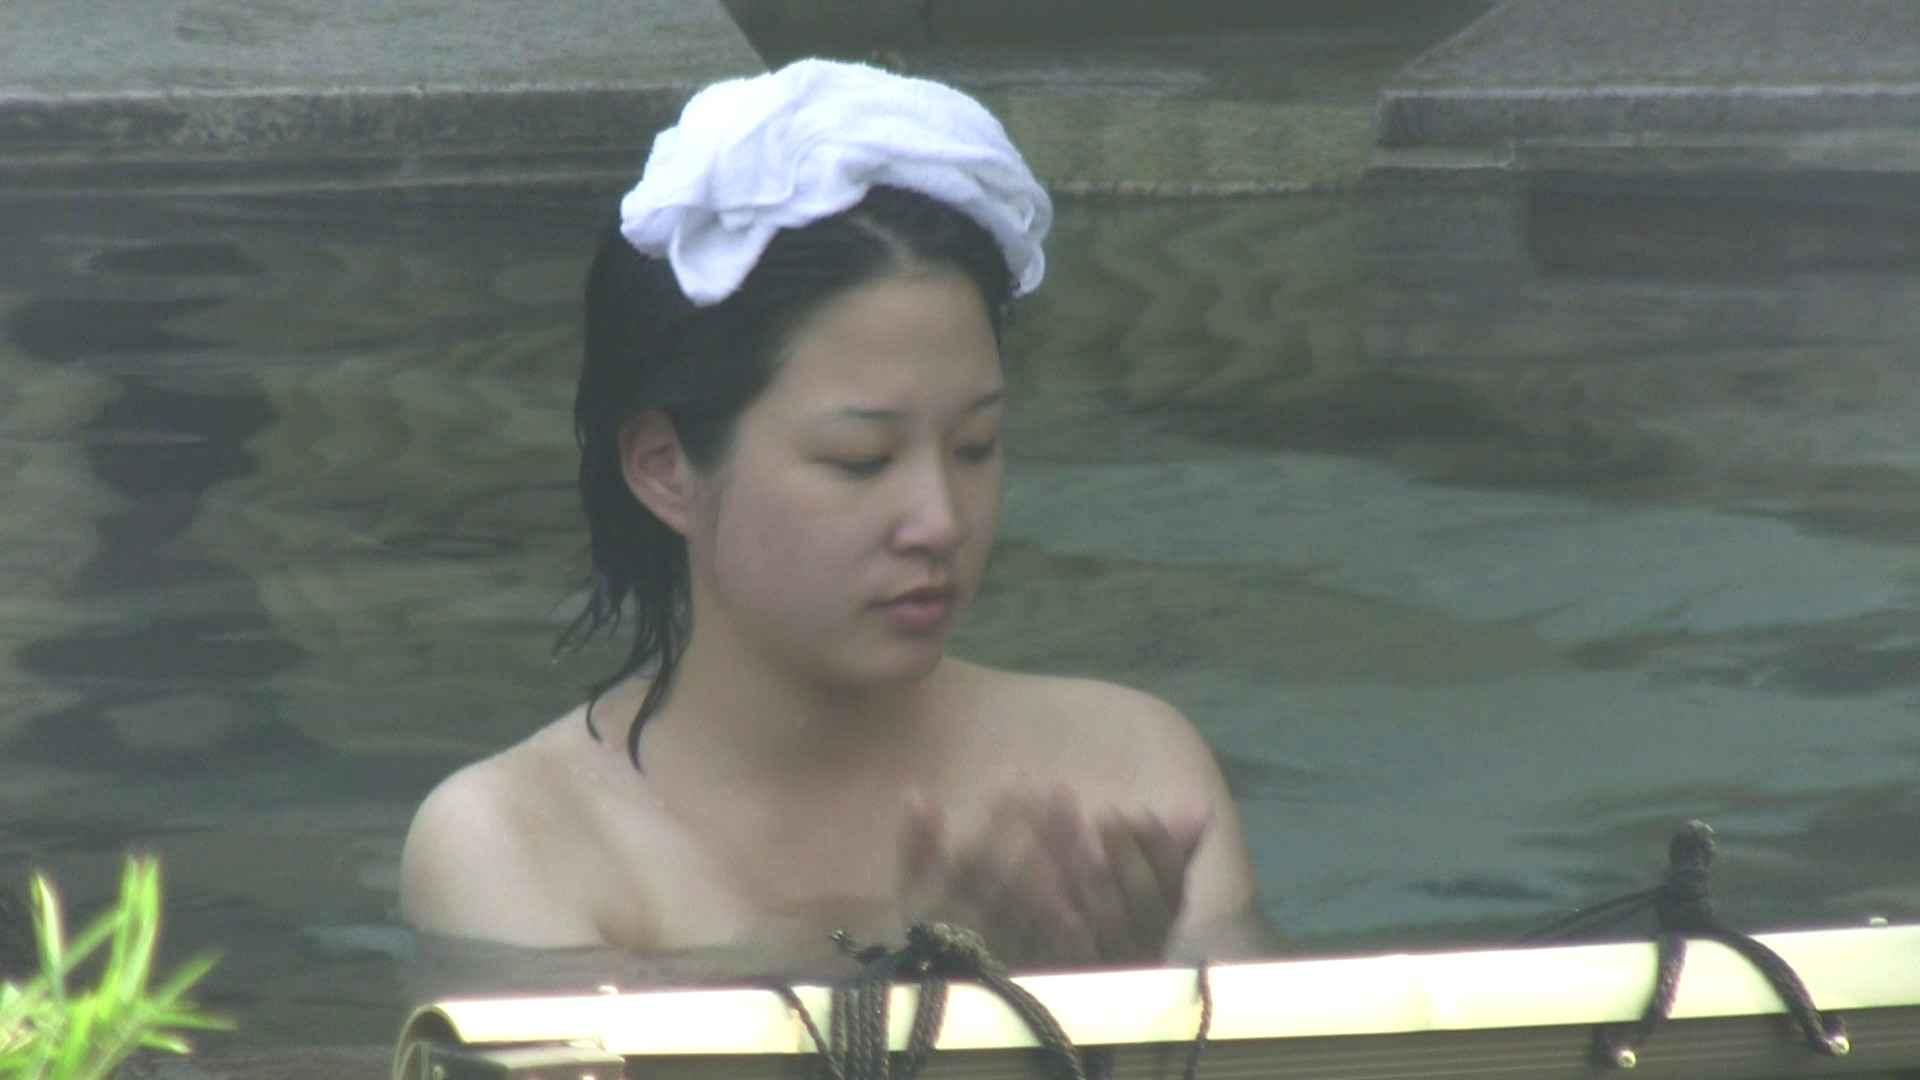 Aquaな露天風呂Vol.172 盗撮映像  113Pix 32